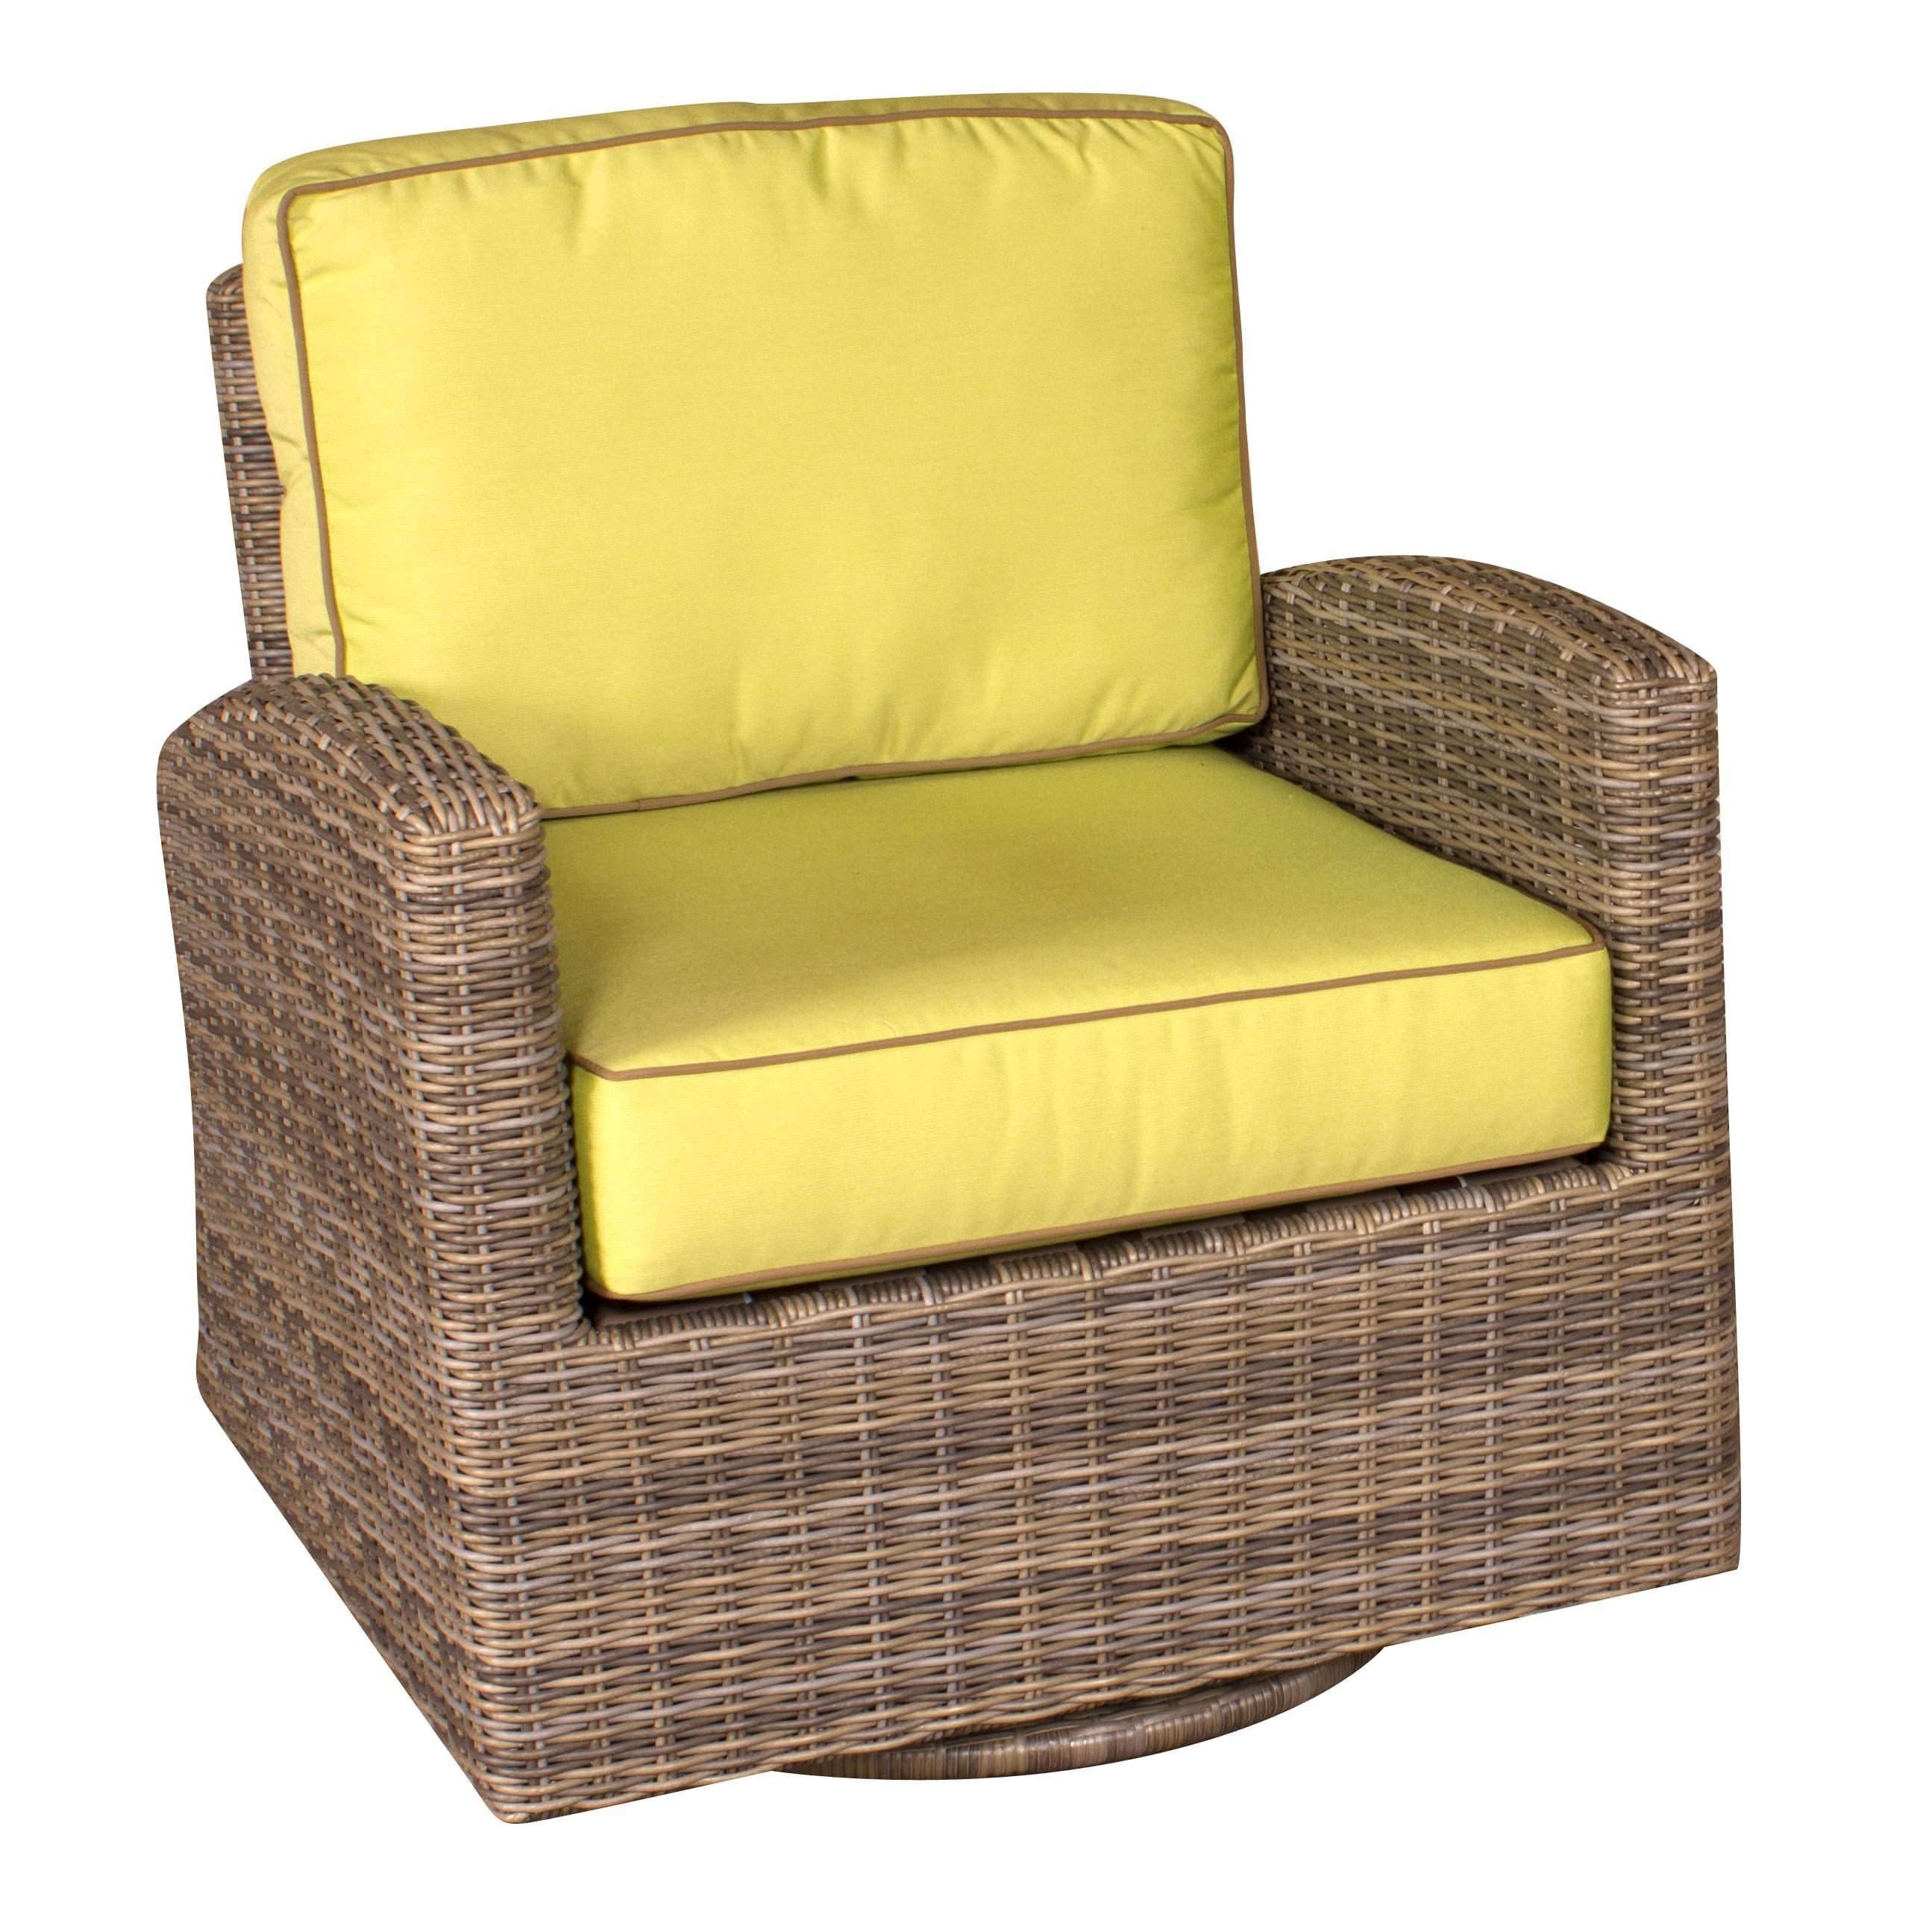 Bainbridge Wicker Swivel Glider Club Chair